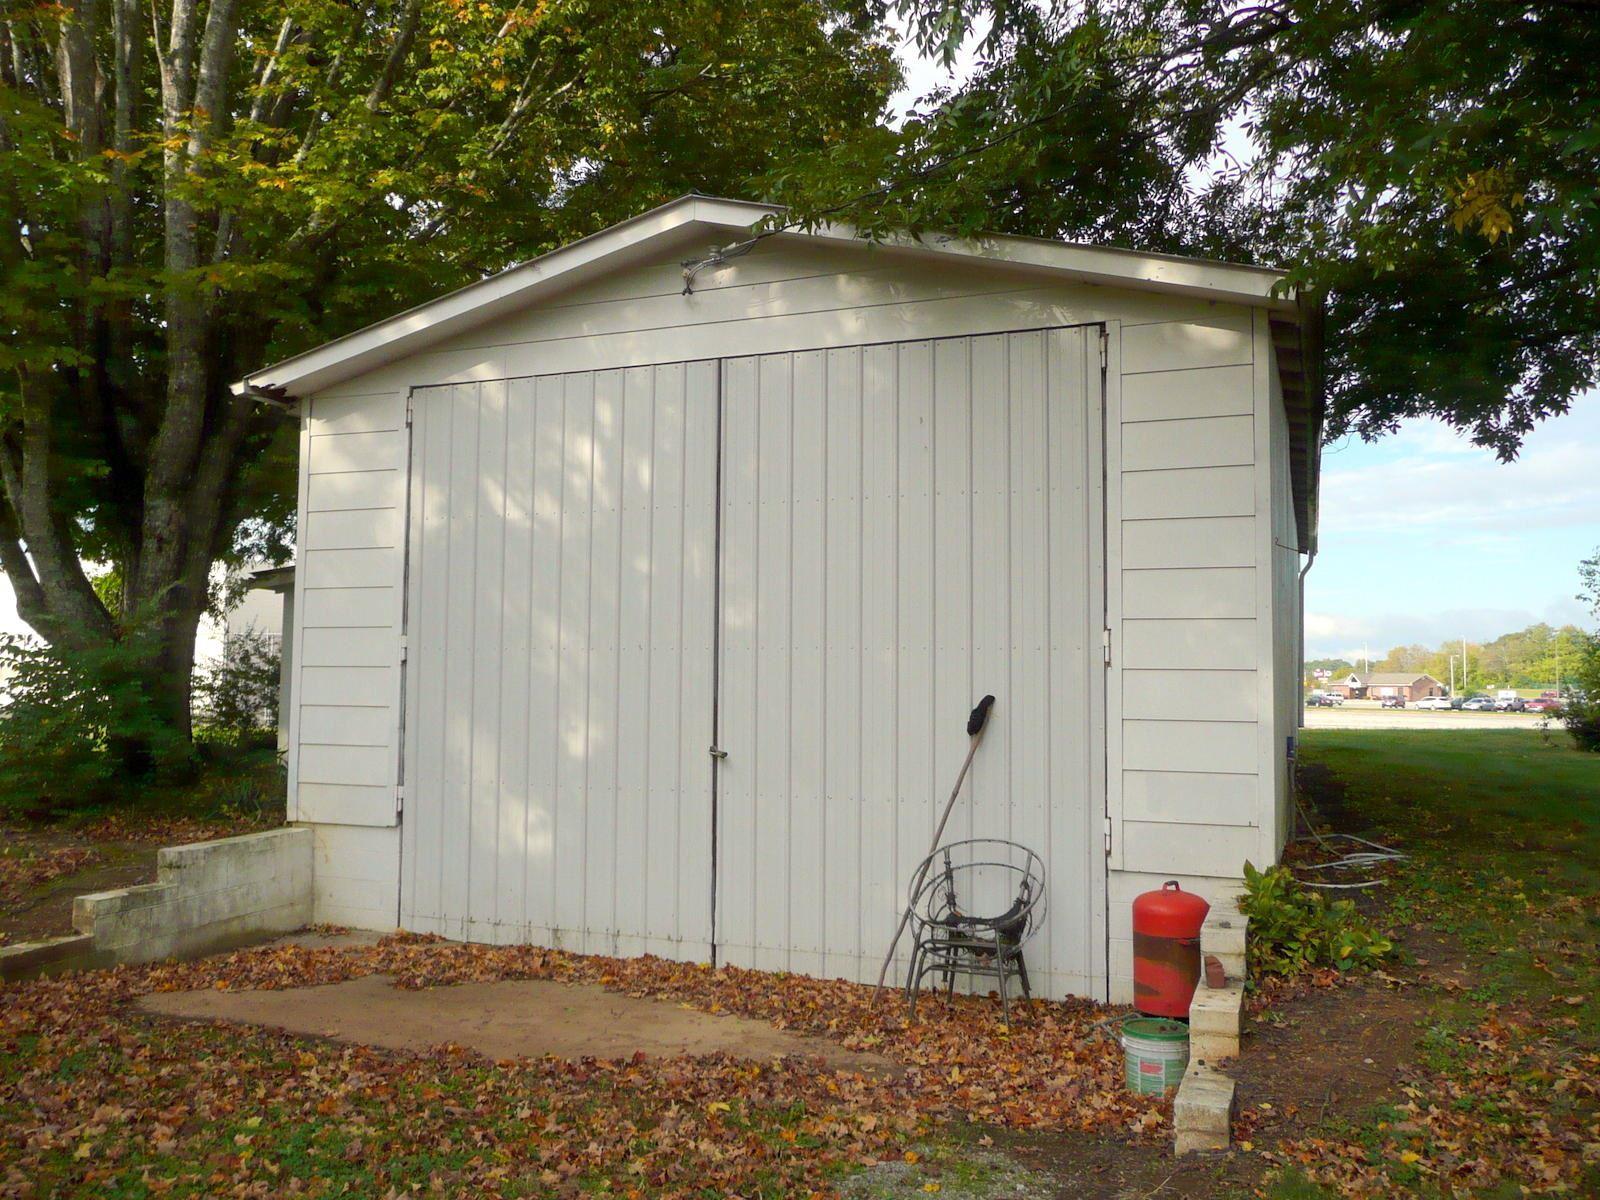 Photo of 920 S Tellico St, Madisonville, TN 37354 (MLS # 1133655)